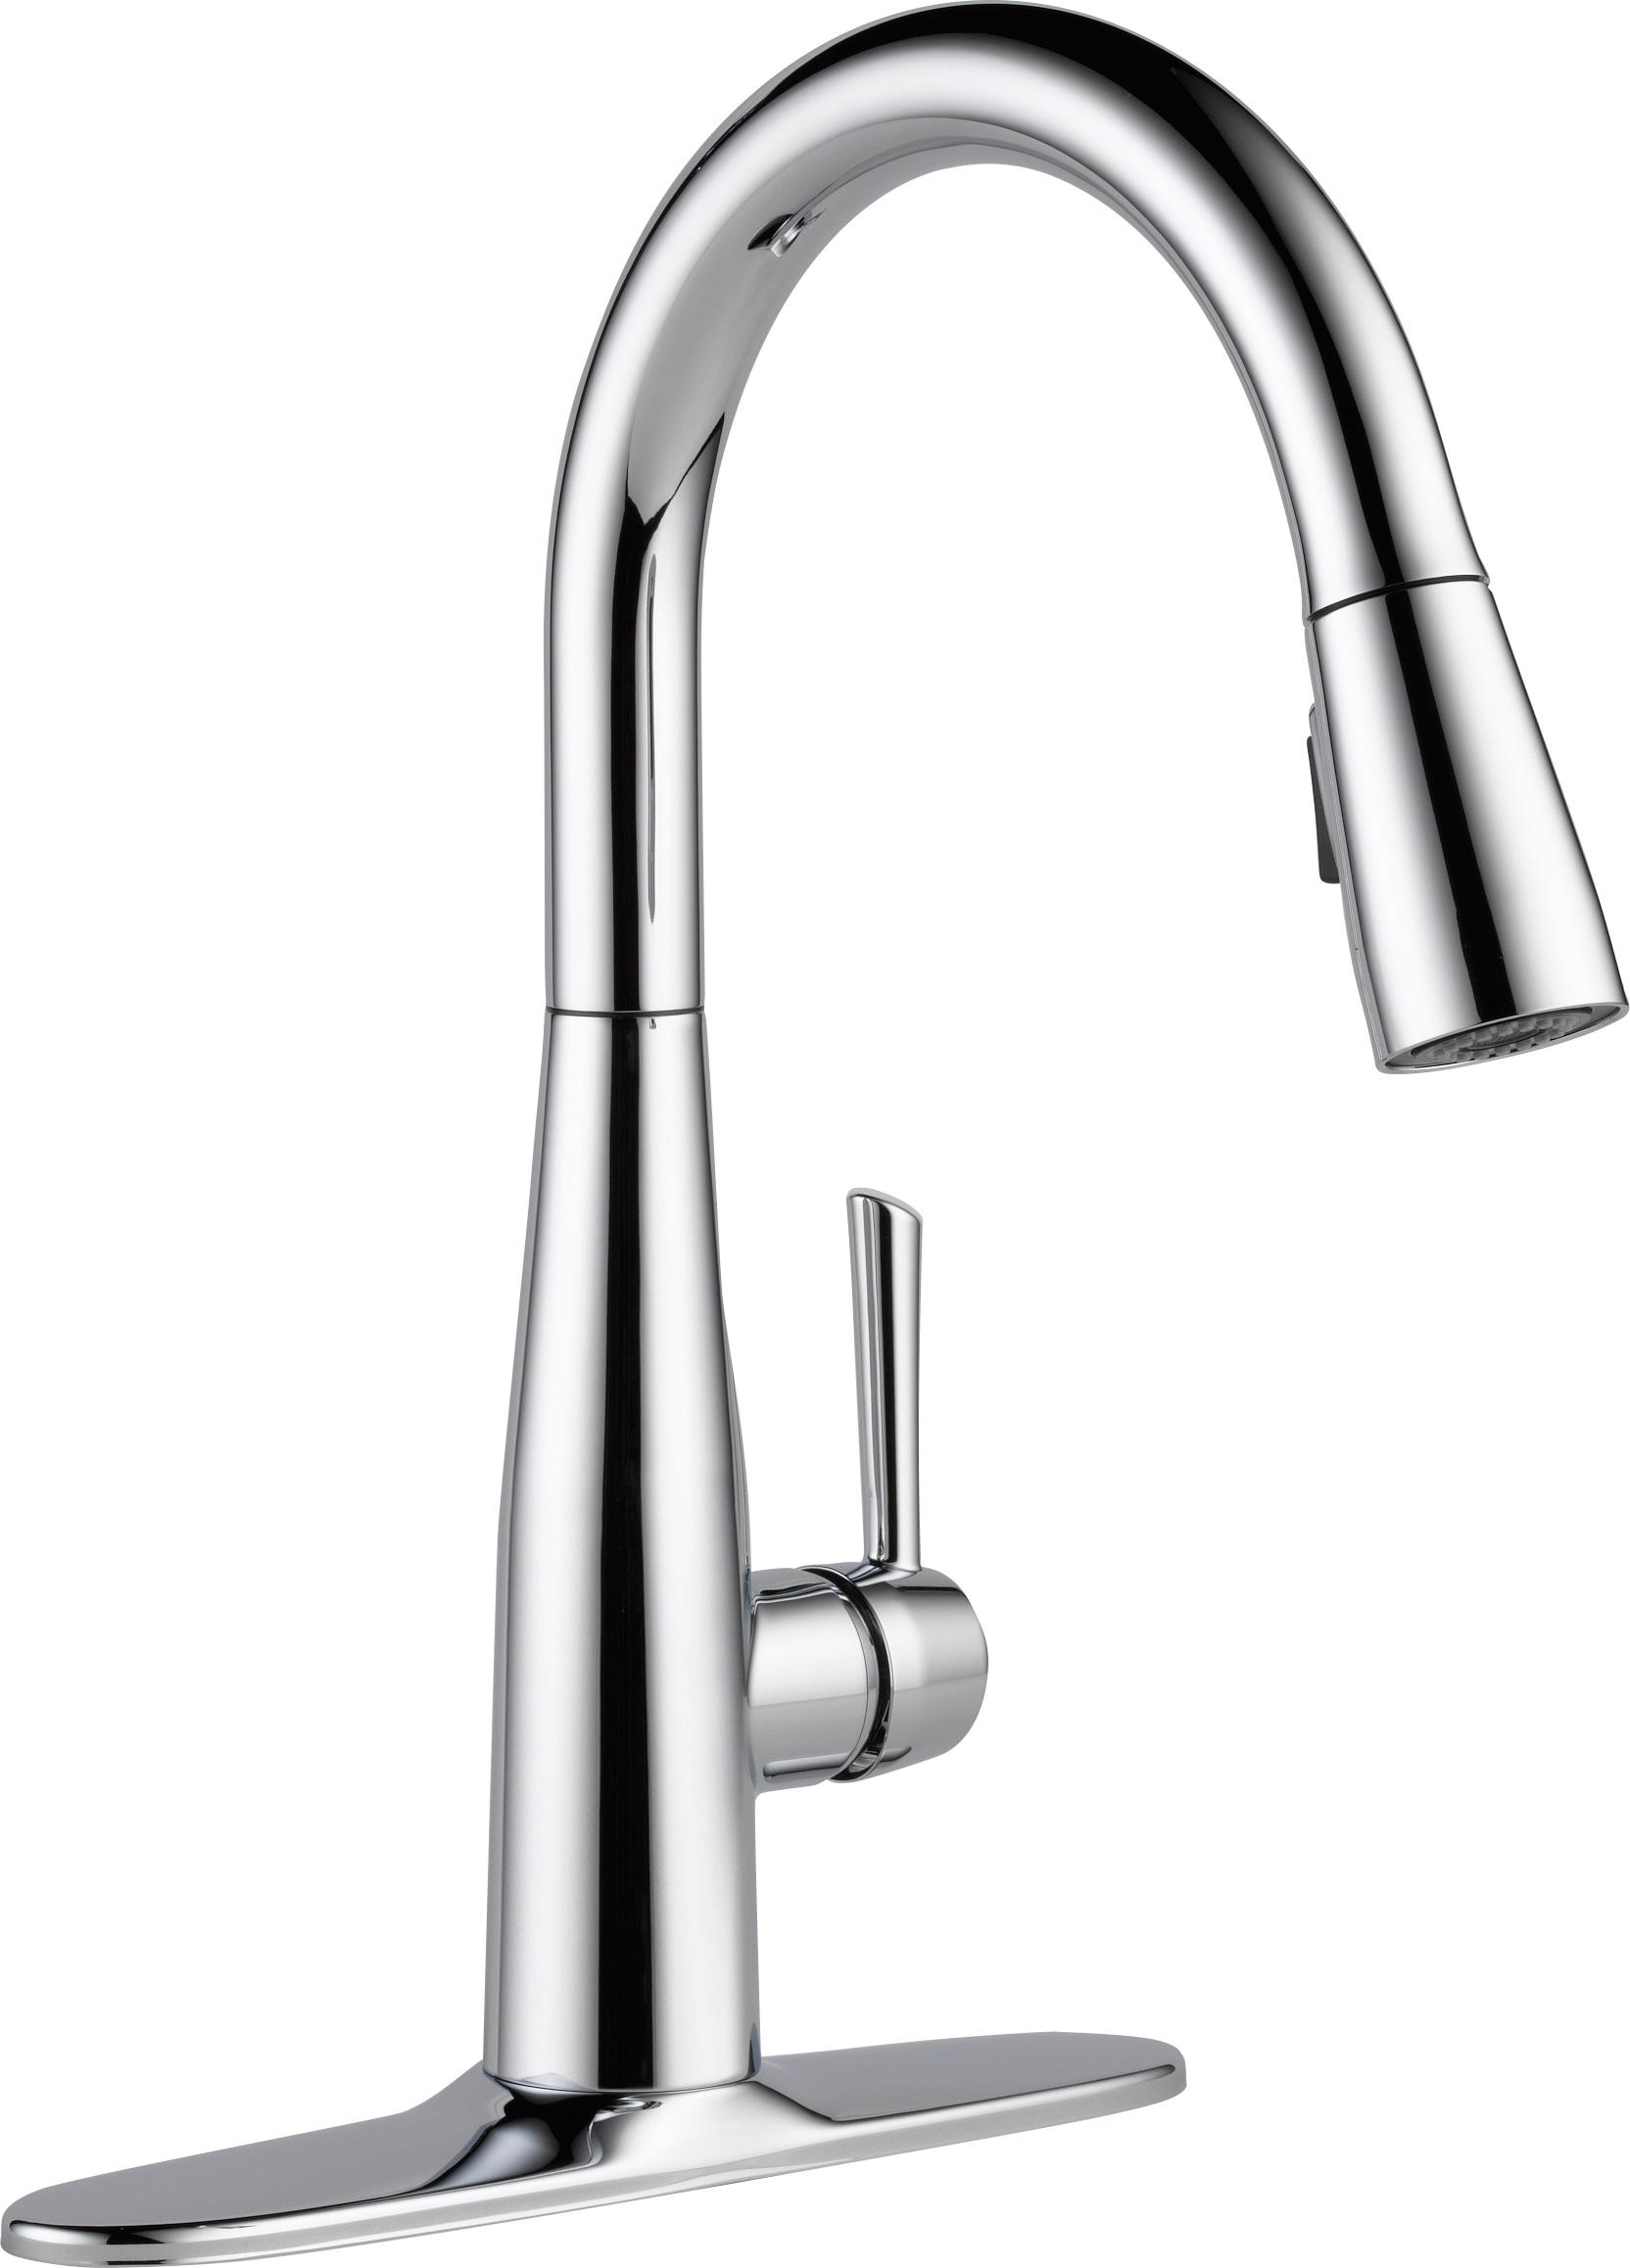 BS delta kitchen faucet Delta Essa Single Handle Pull Down Kitchen Faucet with MagnaTite Docking